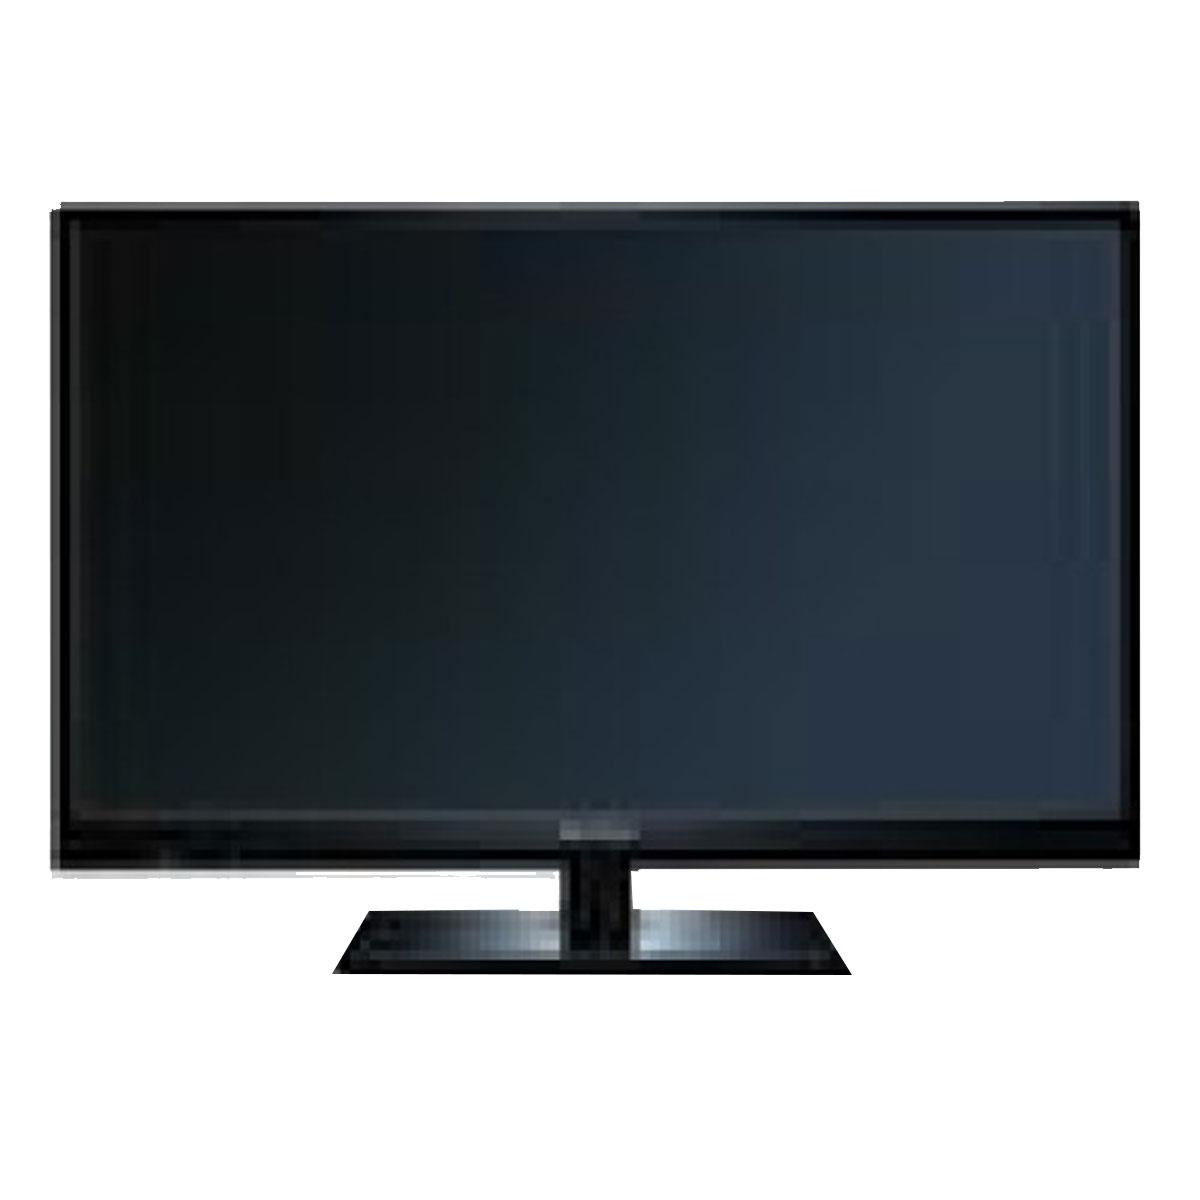 EcoStar 24 Inch HD LED TV (CX24U500)